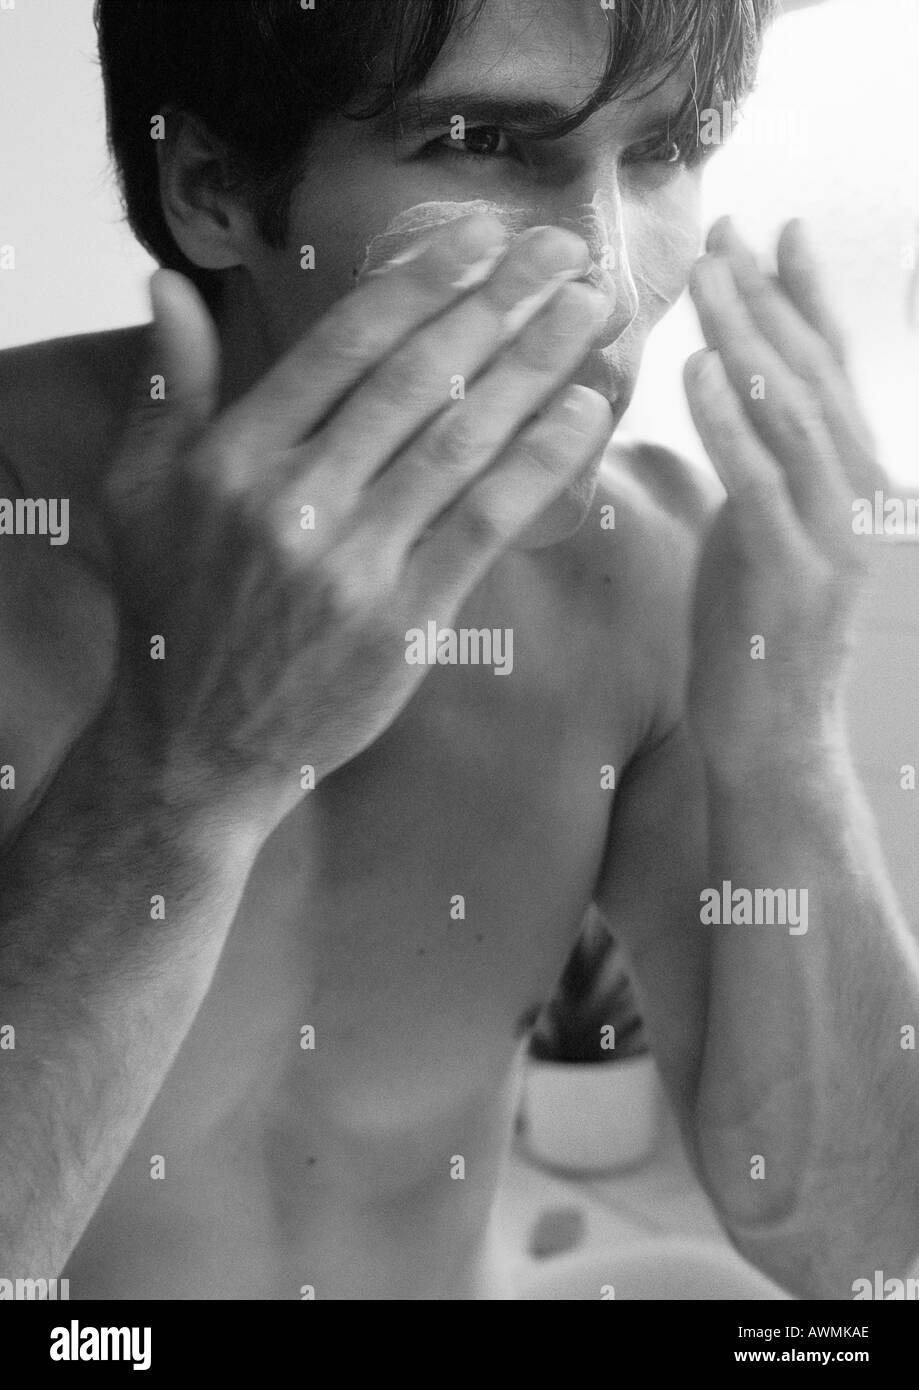 Man putting cream on face, b&w - Stock Image